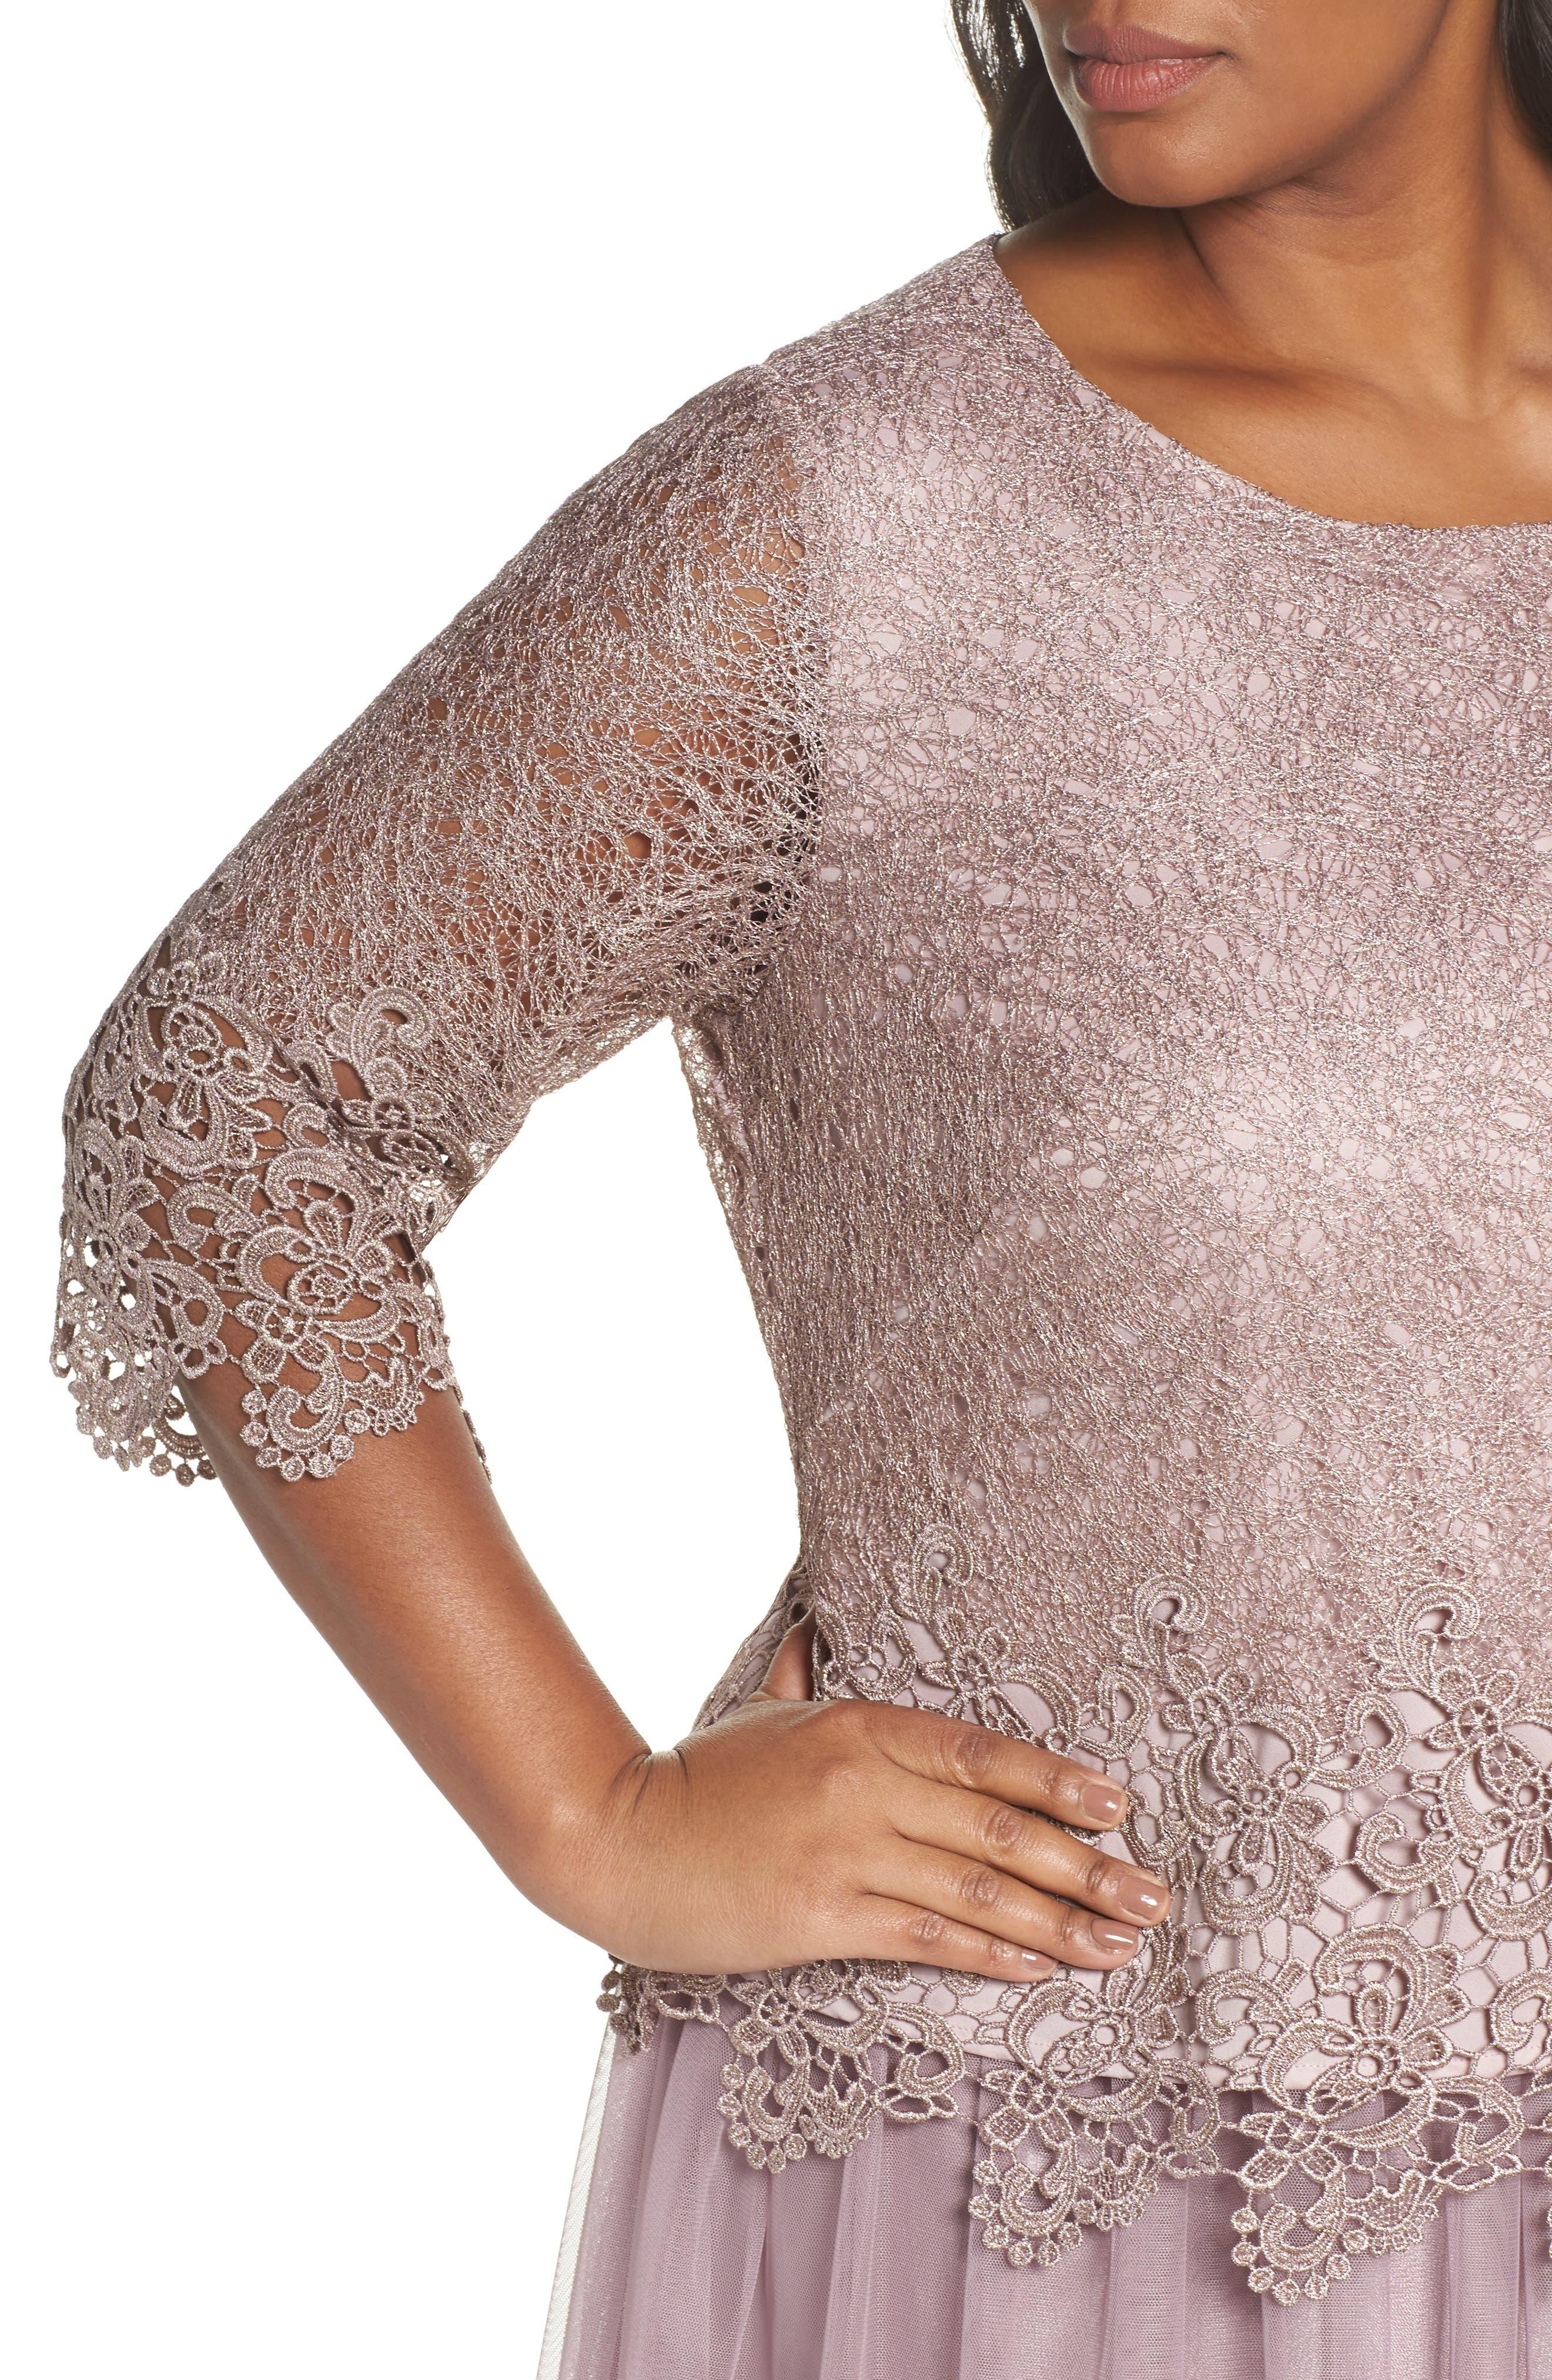 Embellished Mock Two-Piece Tea Length Dress,                             Alternate thumbnail 4, color,                             Rose